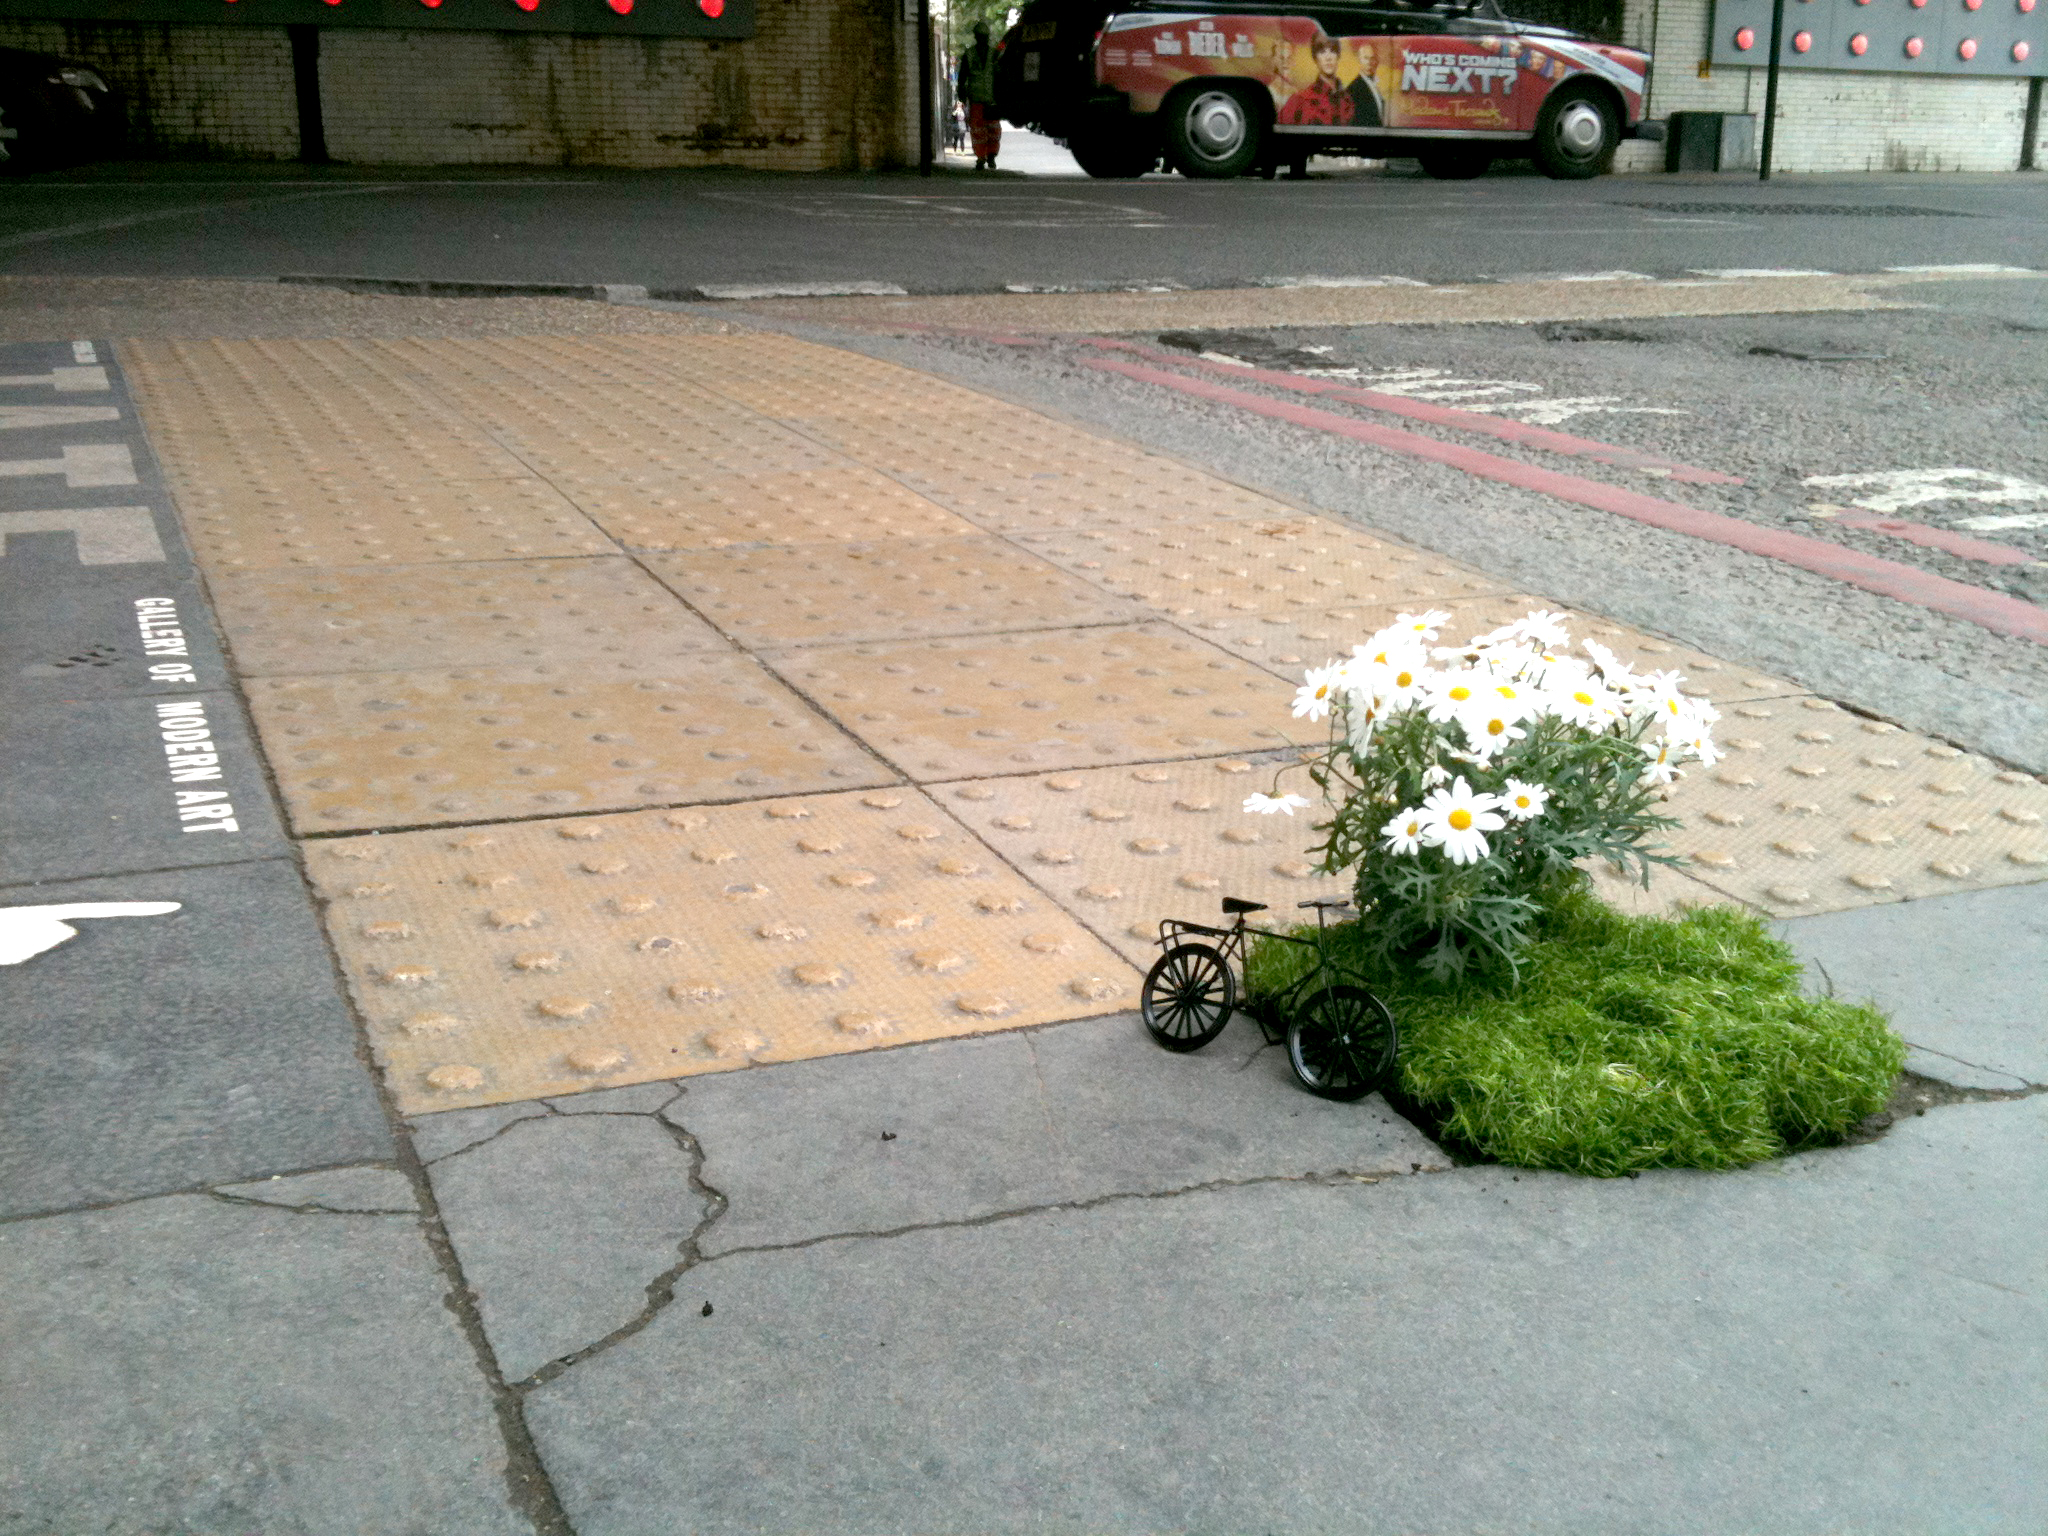 pothole garden bike south london mini garden road steve wheen